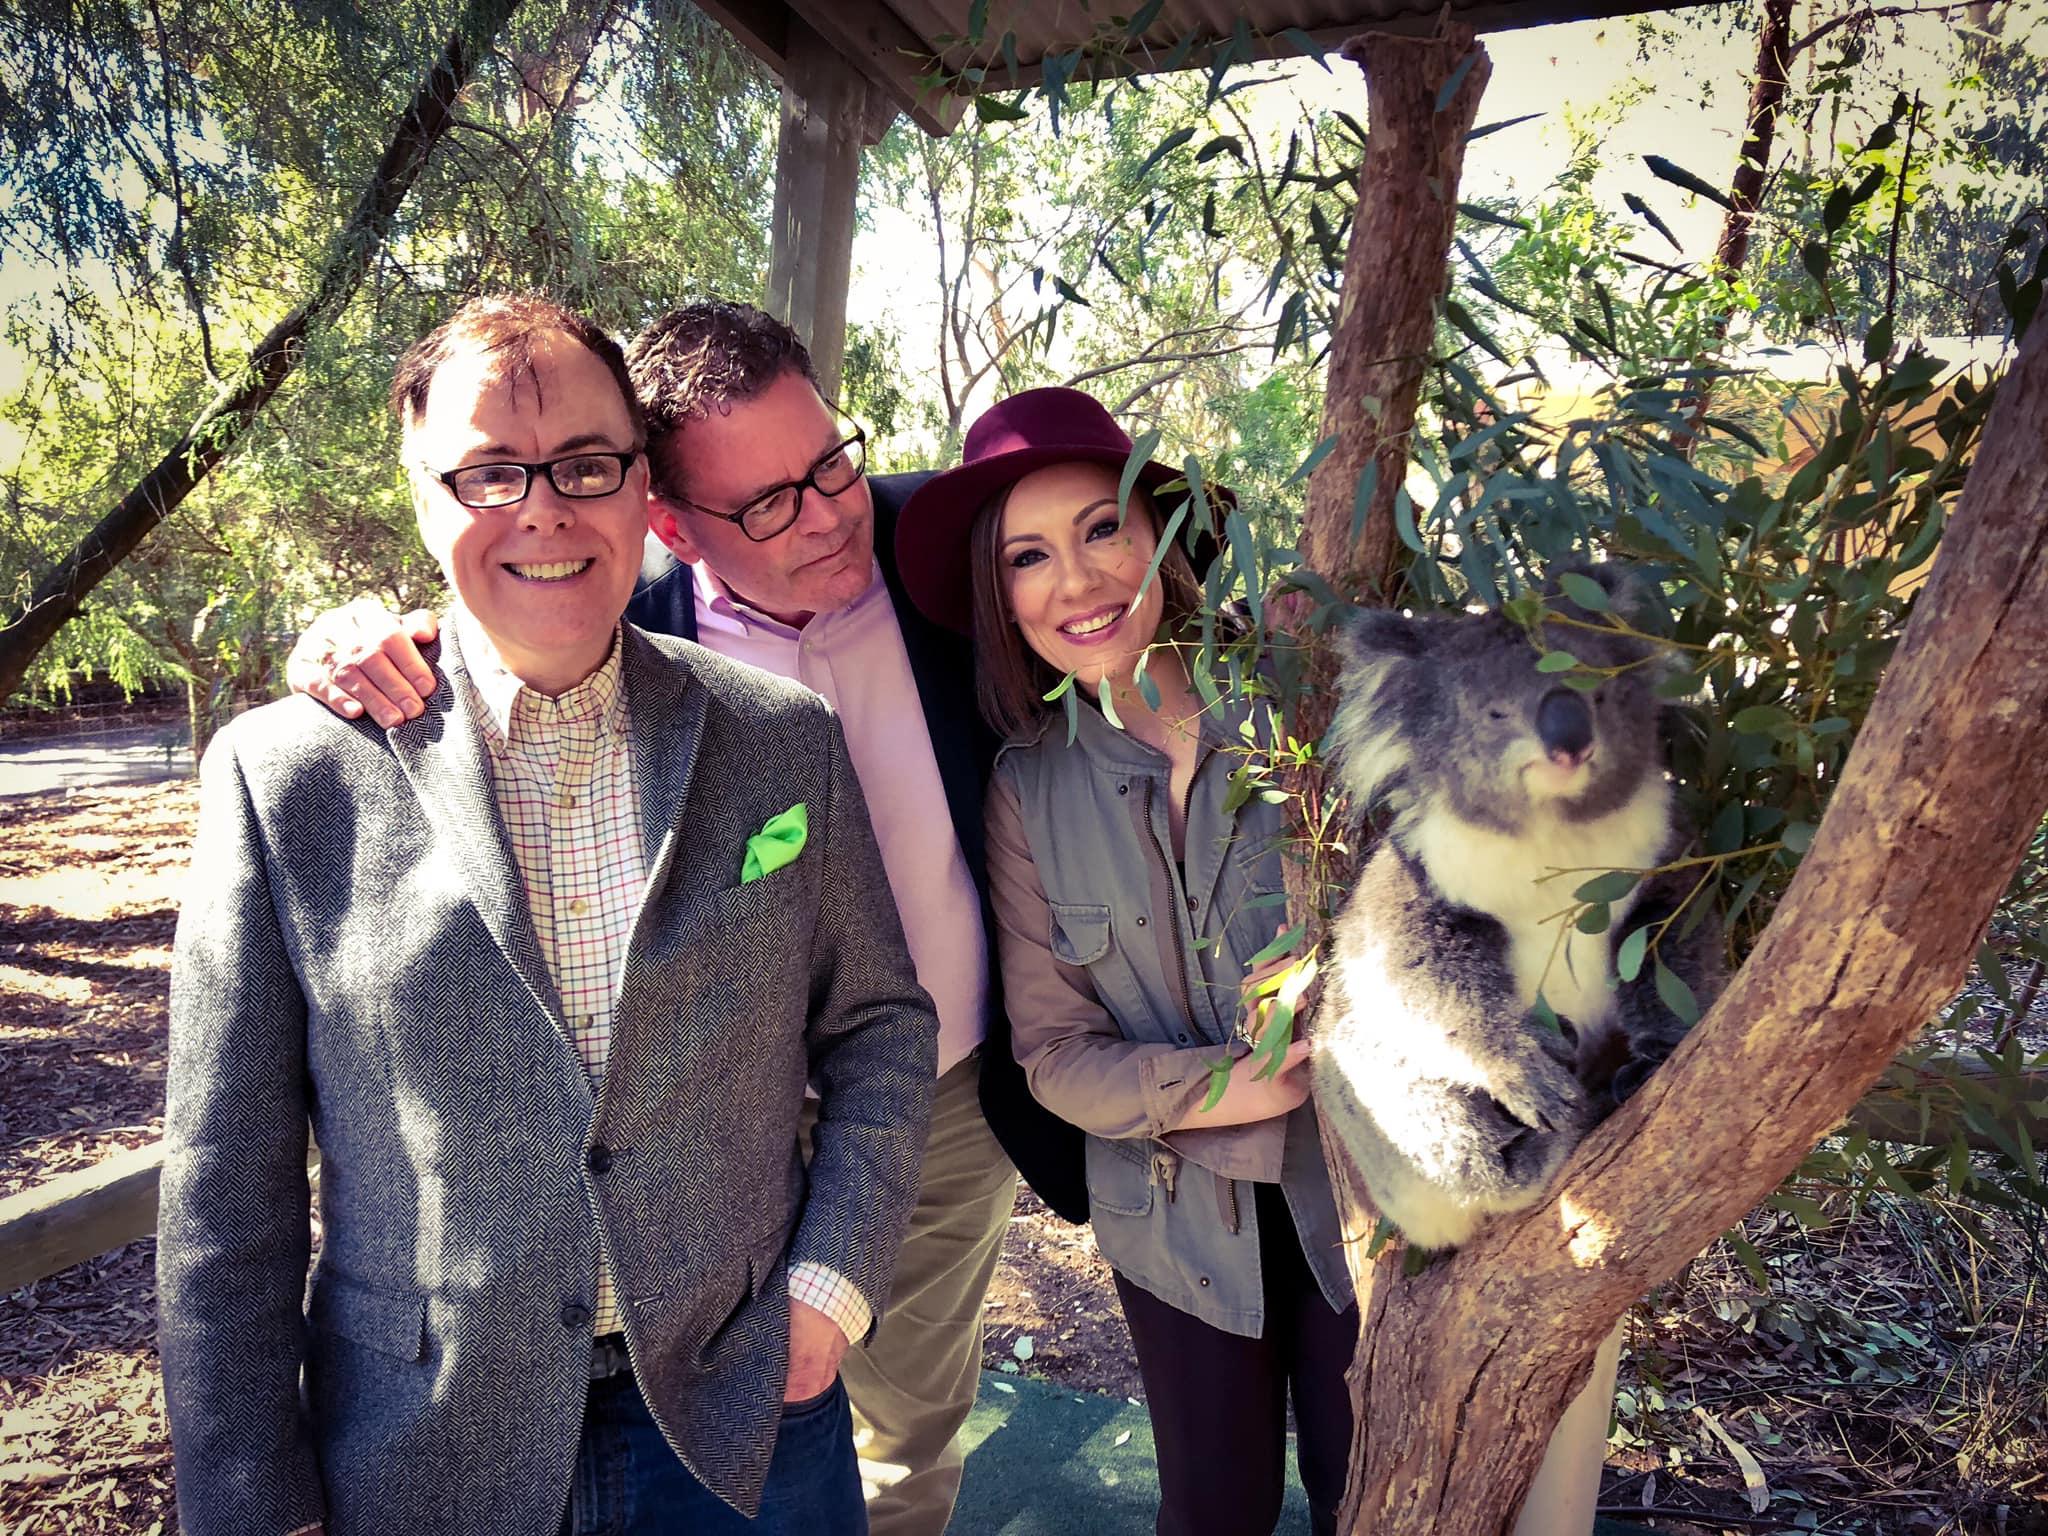 Rachel Hoffman Michael Canadas David Robinson Koala in Australia.jpg